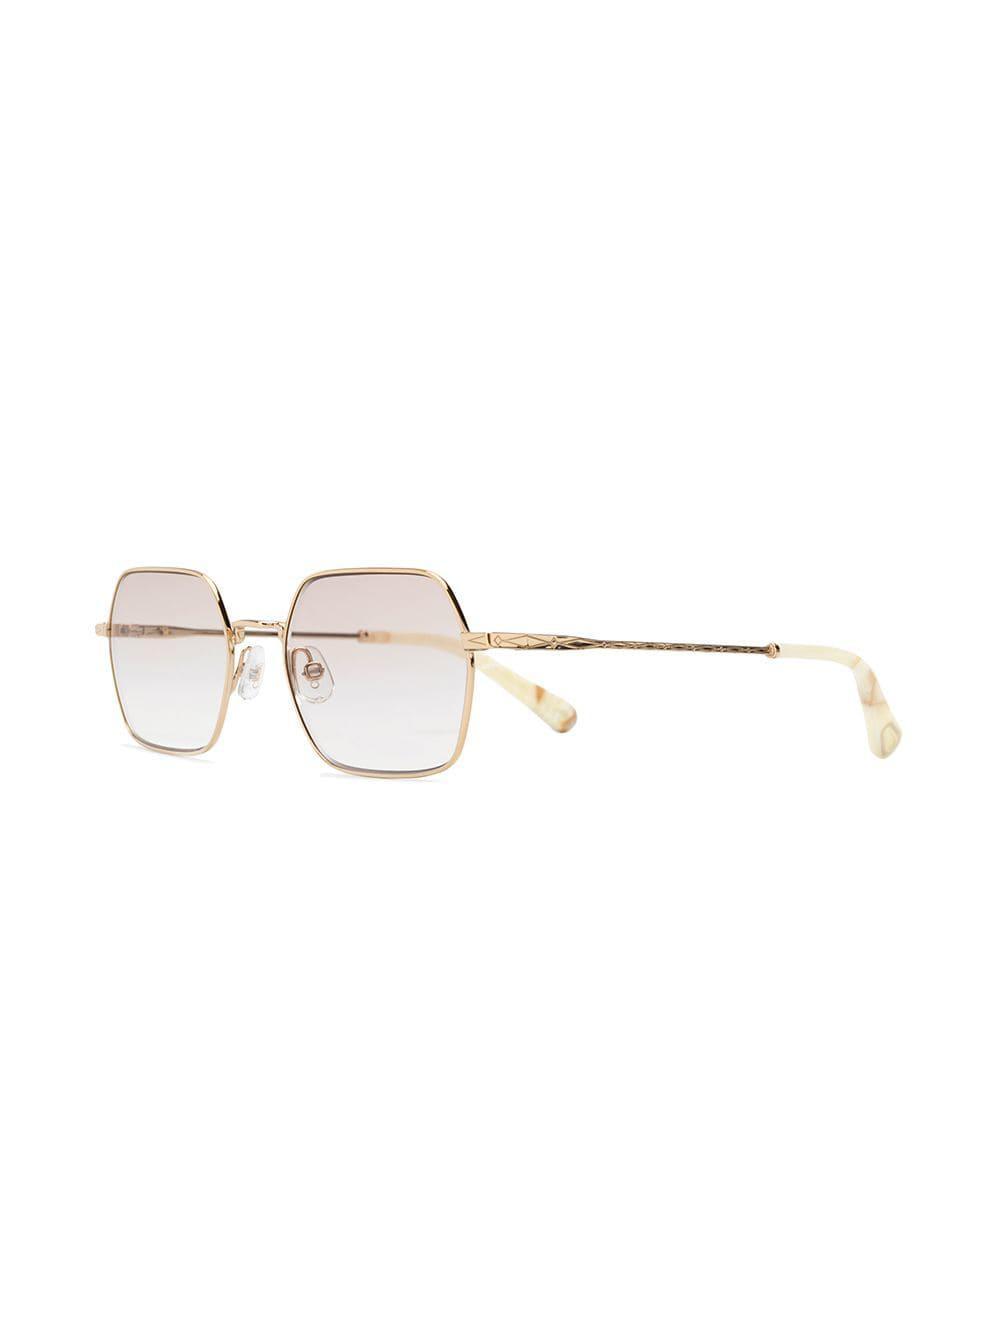 8701ed09af3 Chloé - Metallic Rectangular Frame Glasses - Lyst. View fullscreen